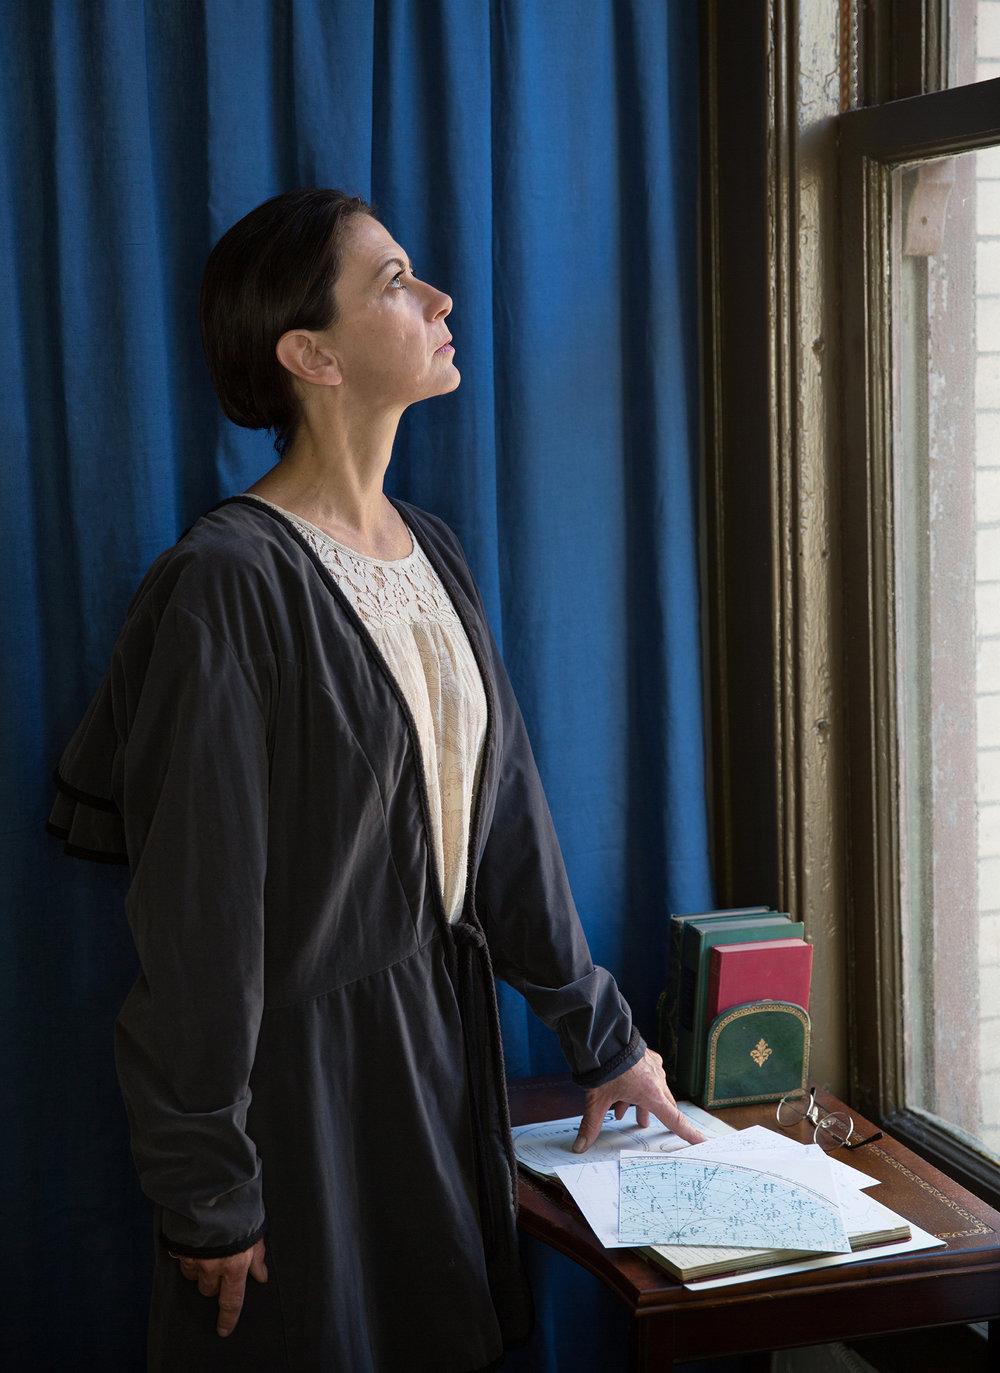 Micol Hebron as Cecilia Payne-Gaposchkin